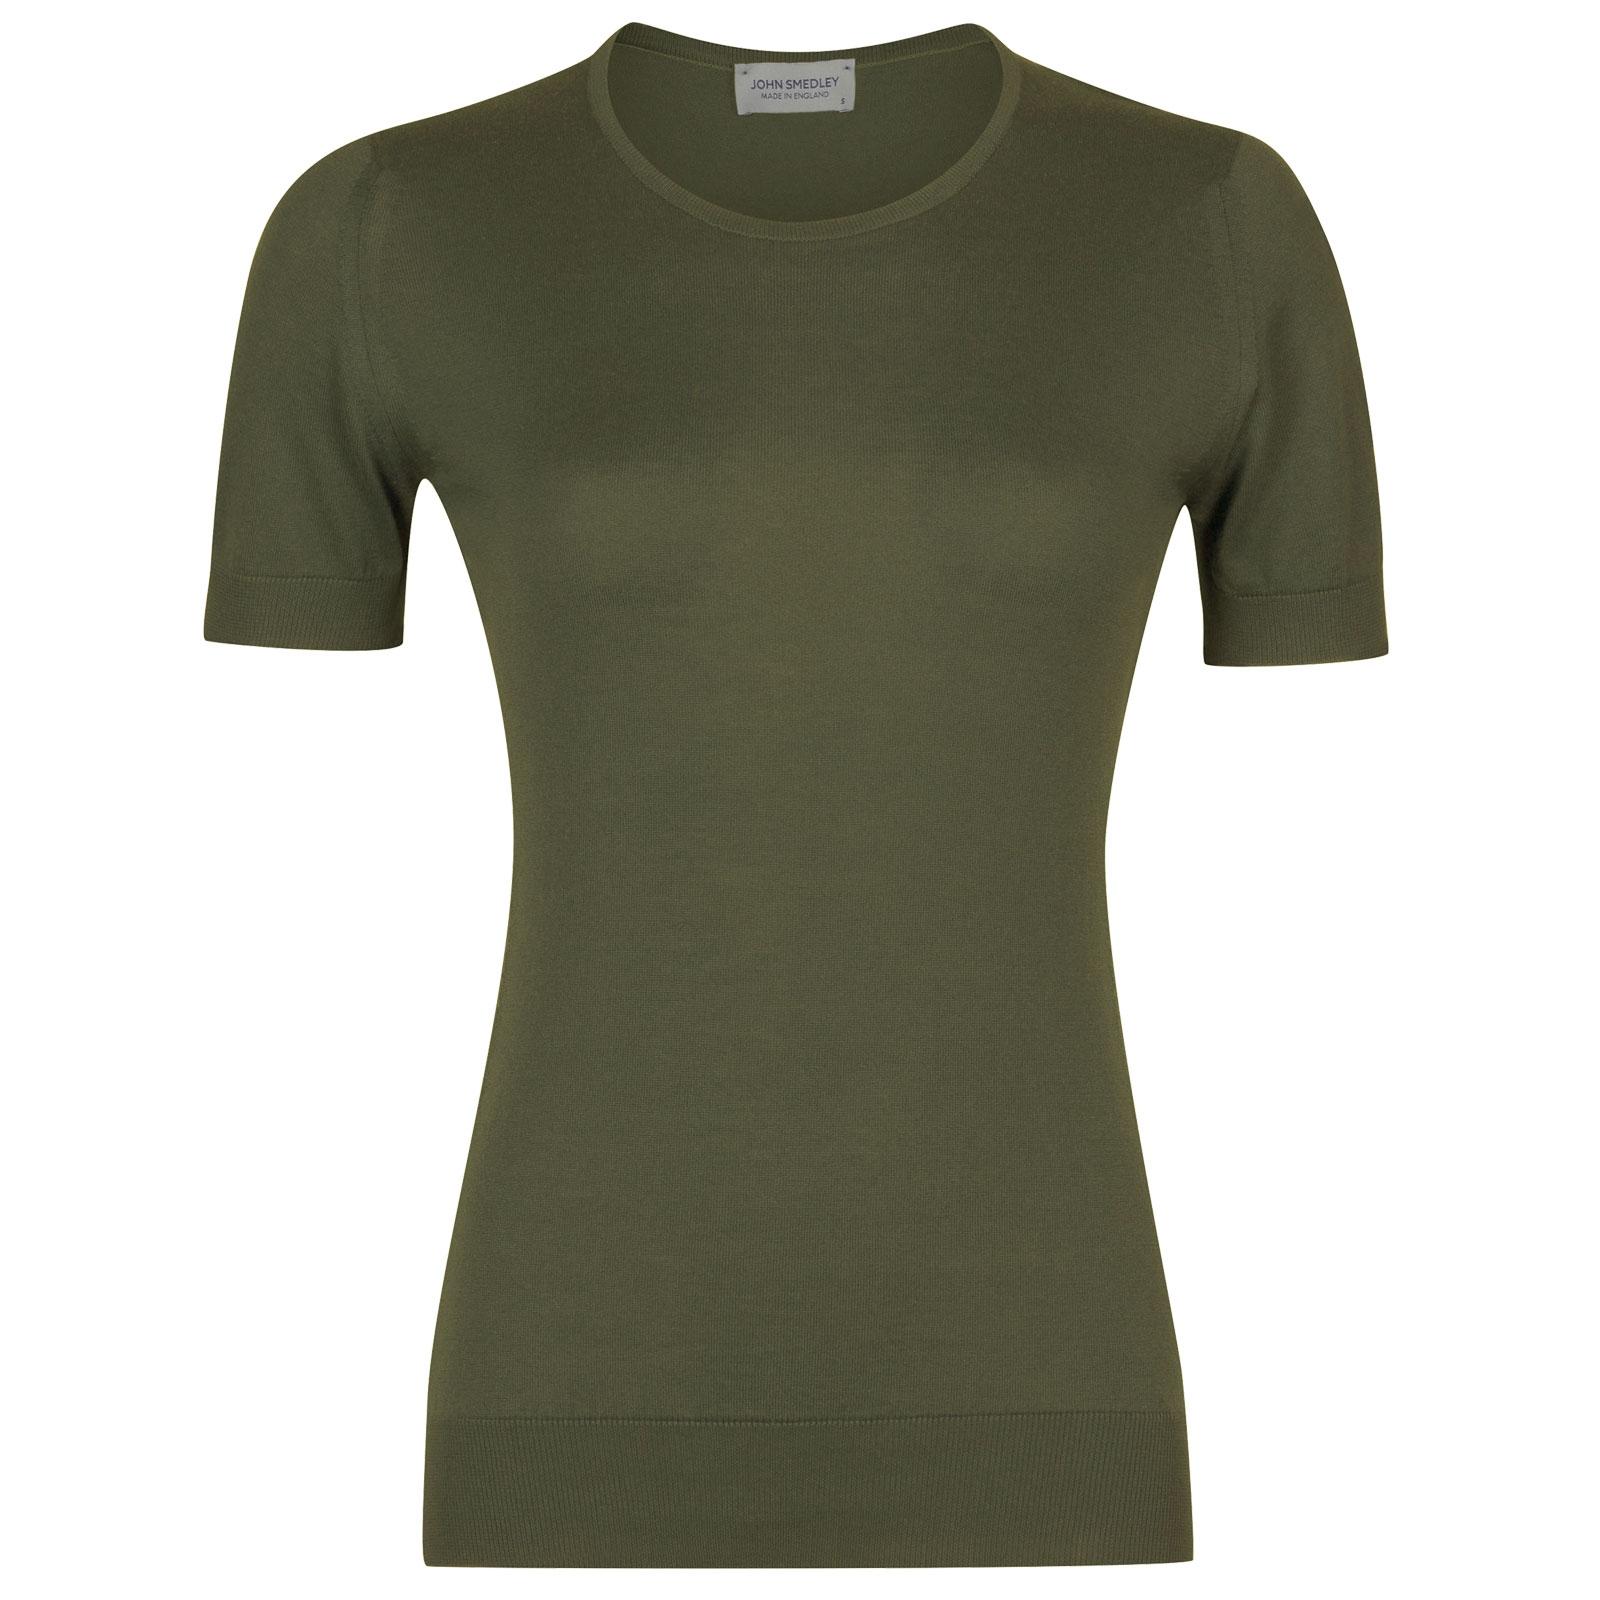 John Smedley Daniella in Sepal Green Sweater-XLG